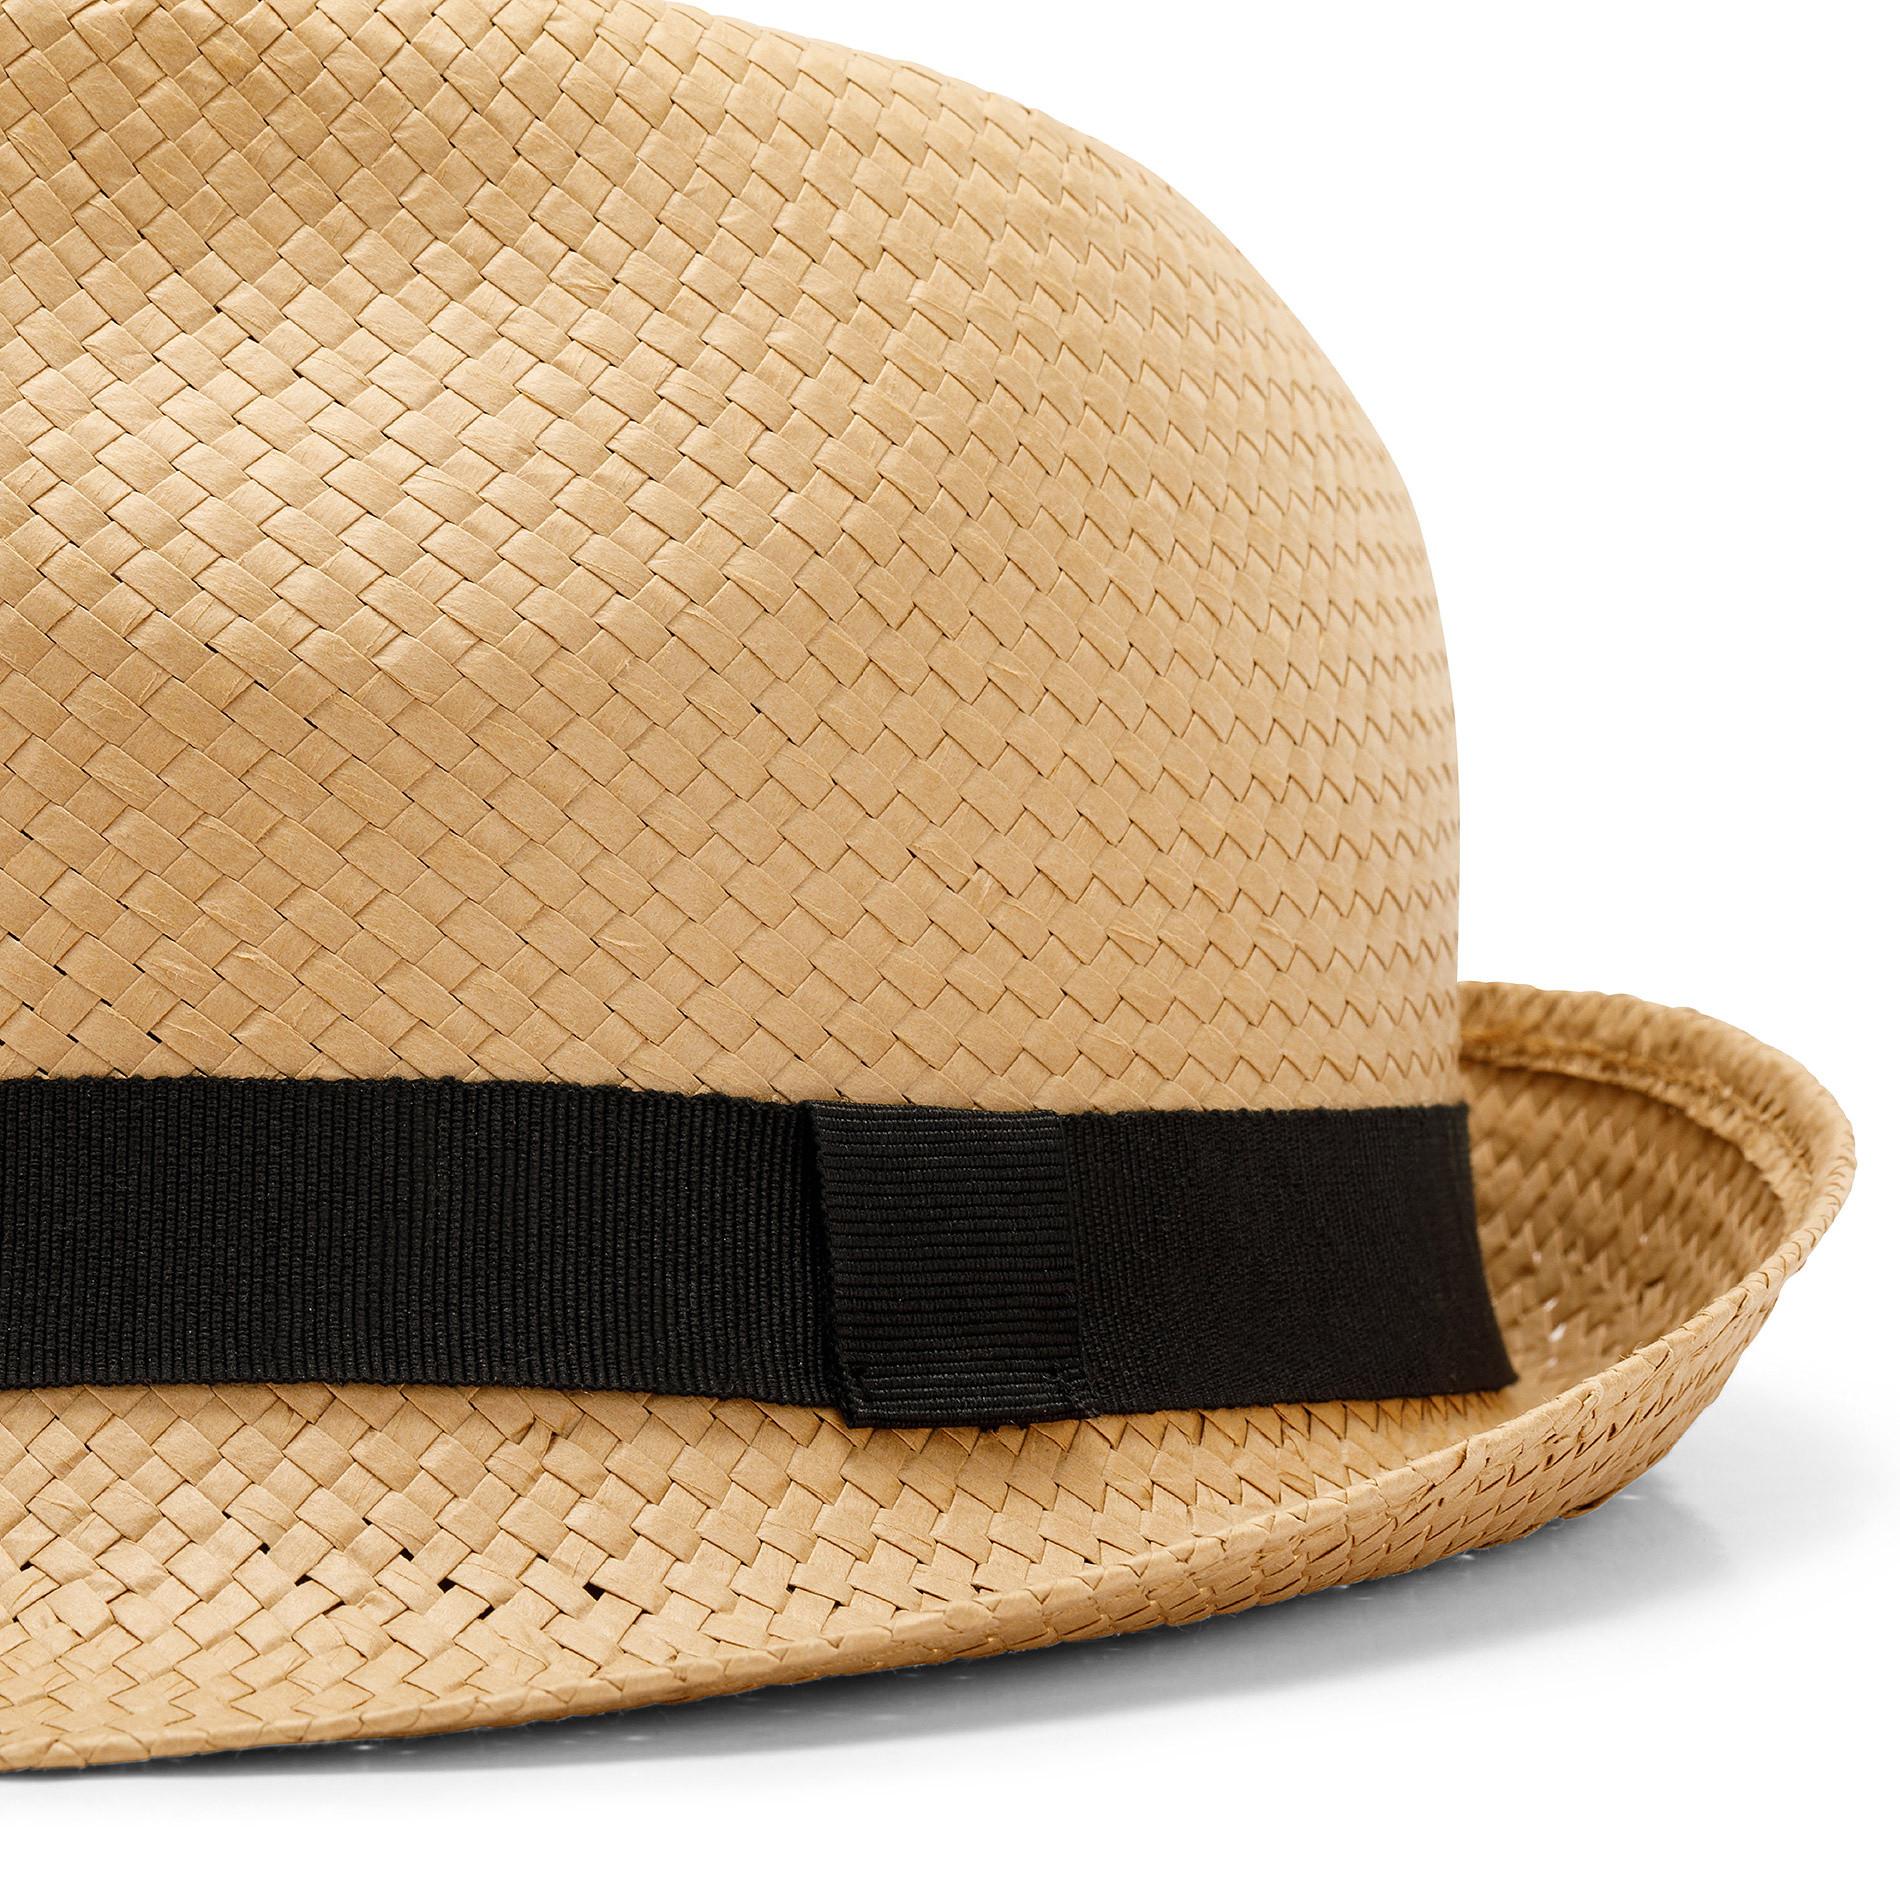 Cappello paglia intrecciata Luca D'Altieri, Beige, large image number 1